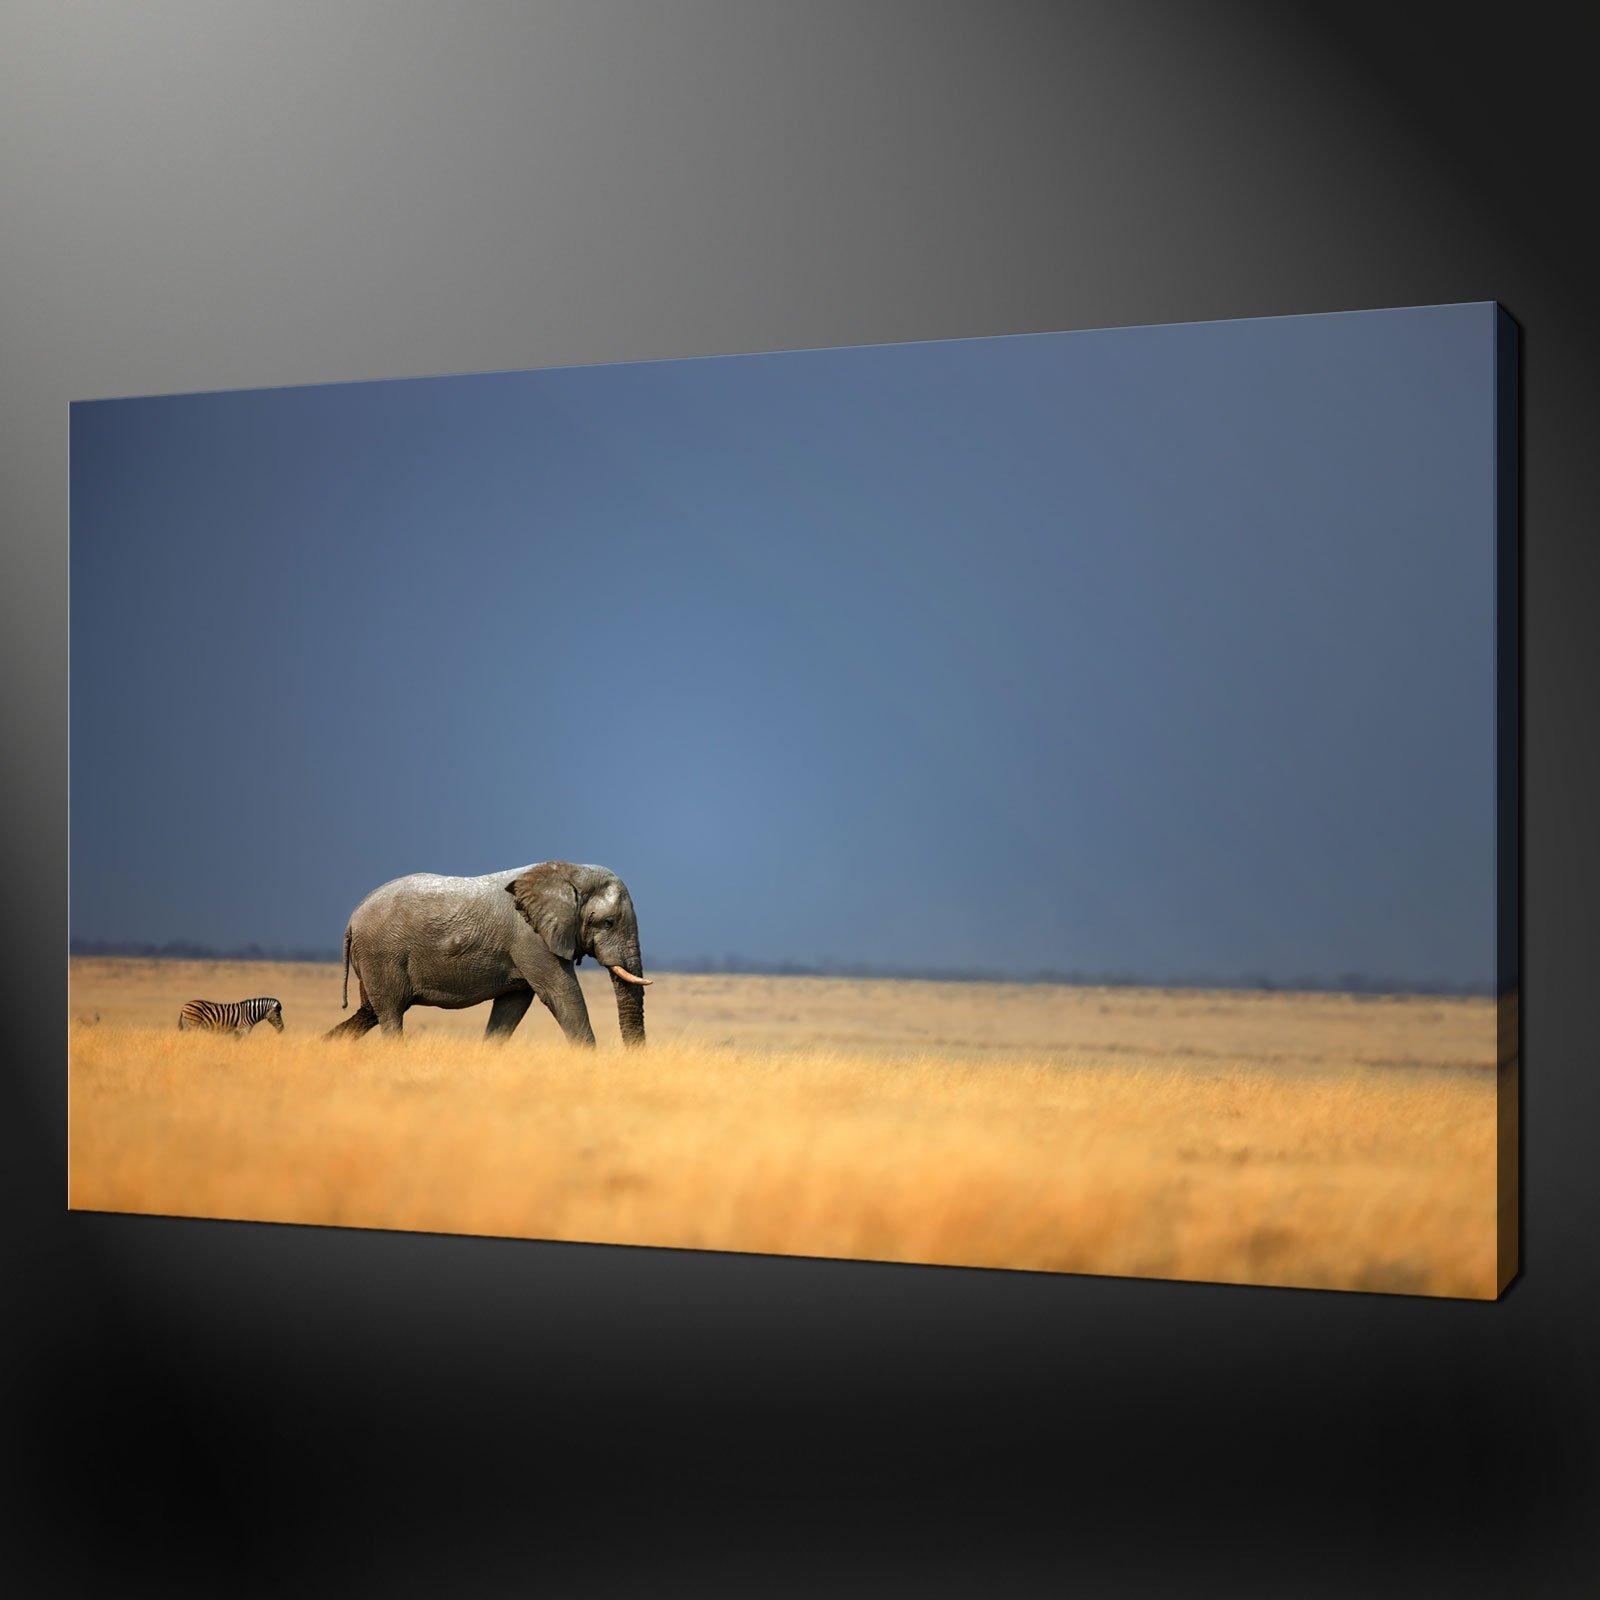 Wall Art Canvas Prints zebra and elephant premium canvas print picture wall art design